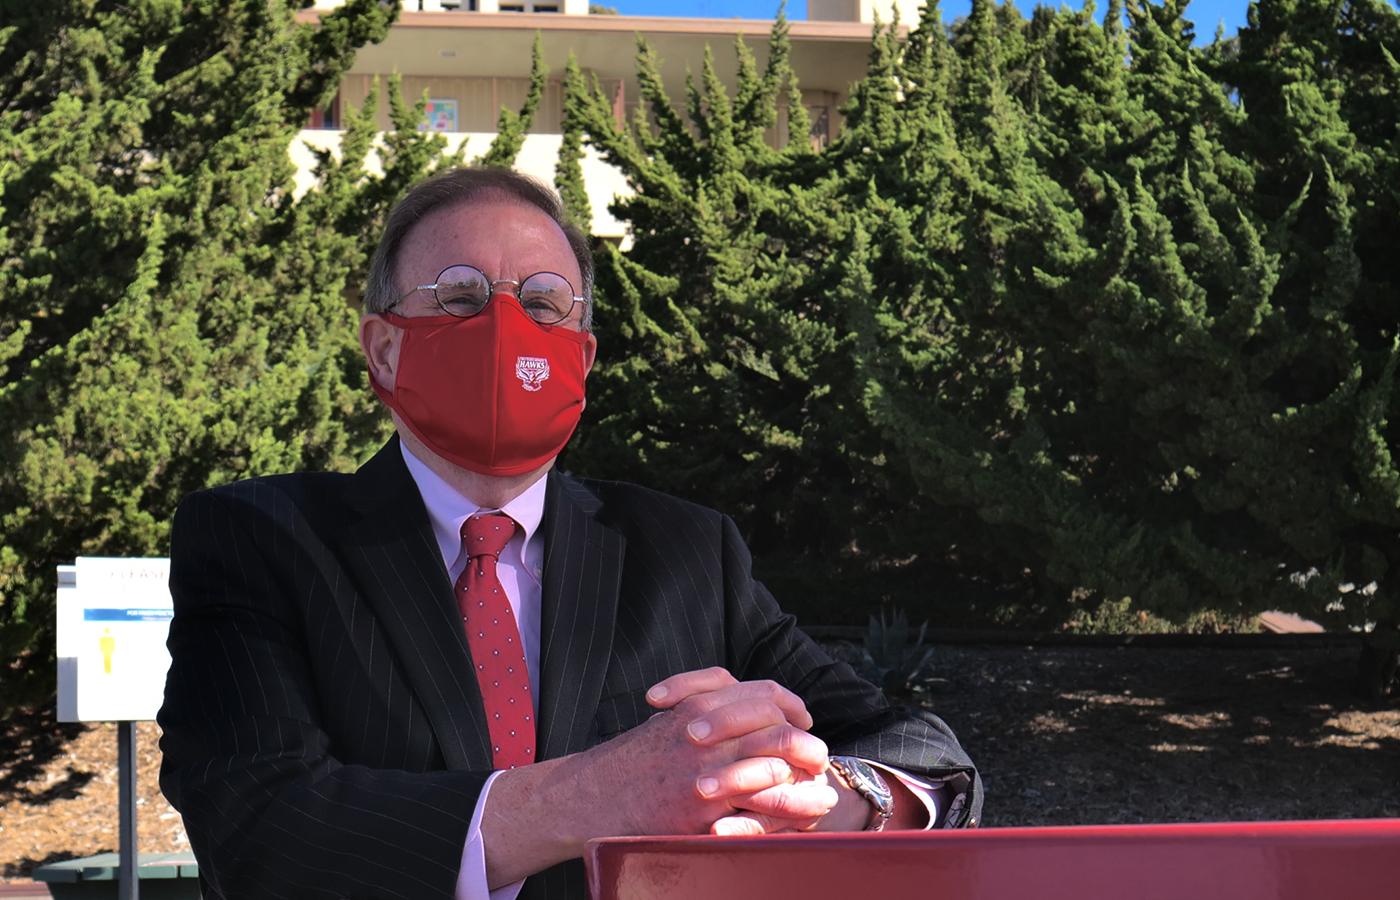 HNU President Mike Groener